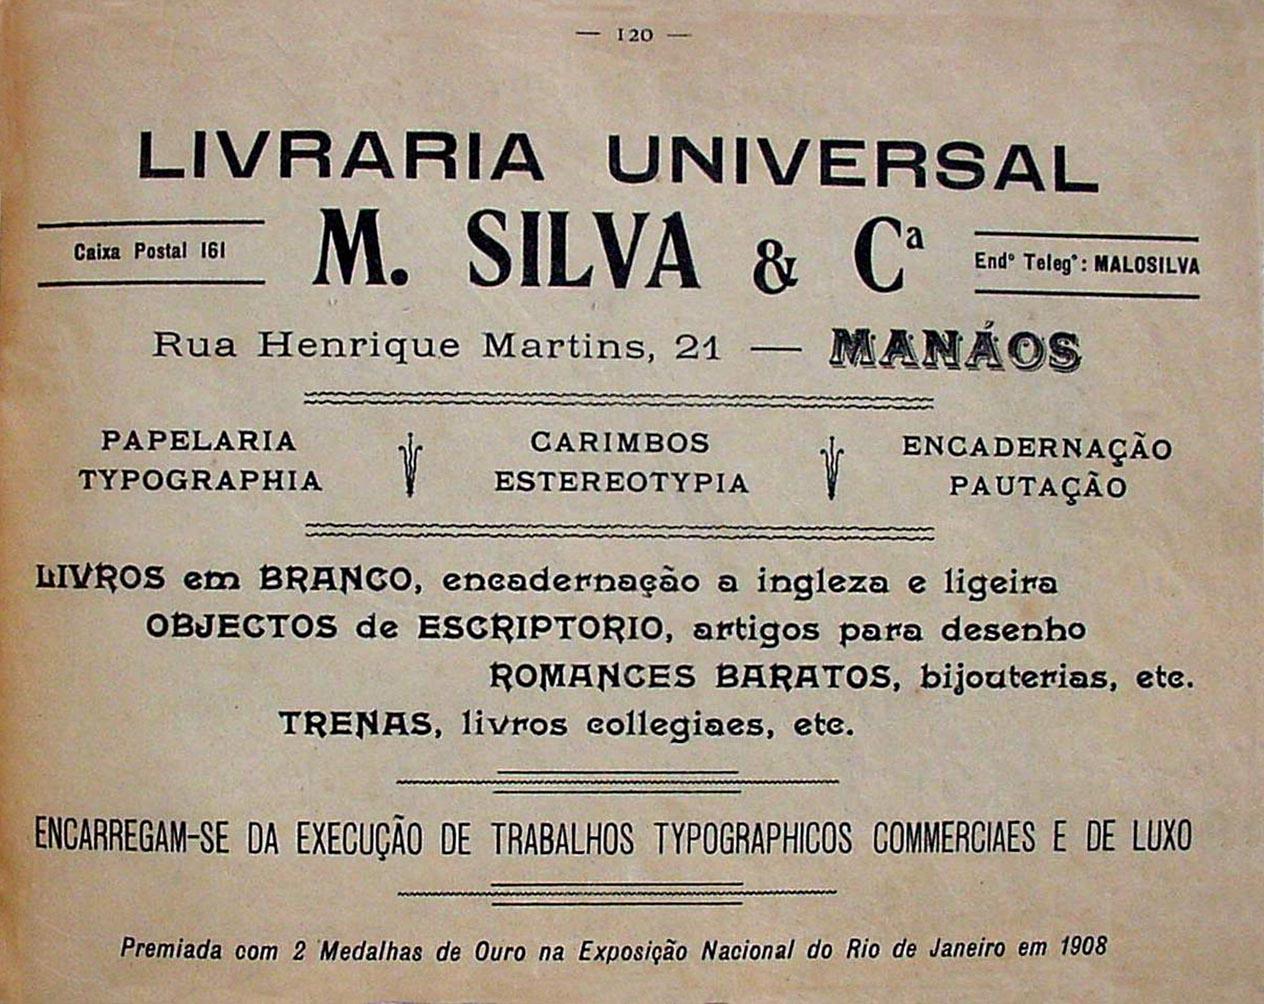 Propaganda da Livraria Universal